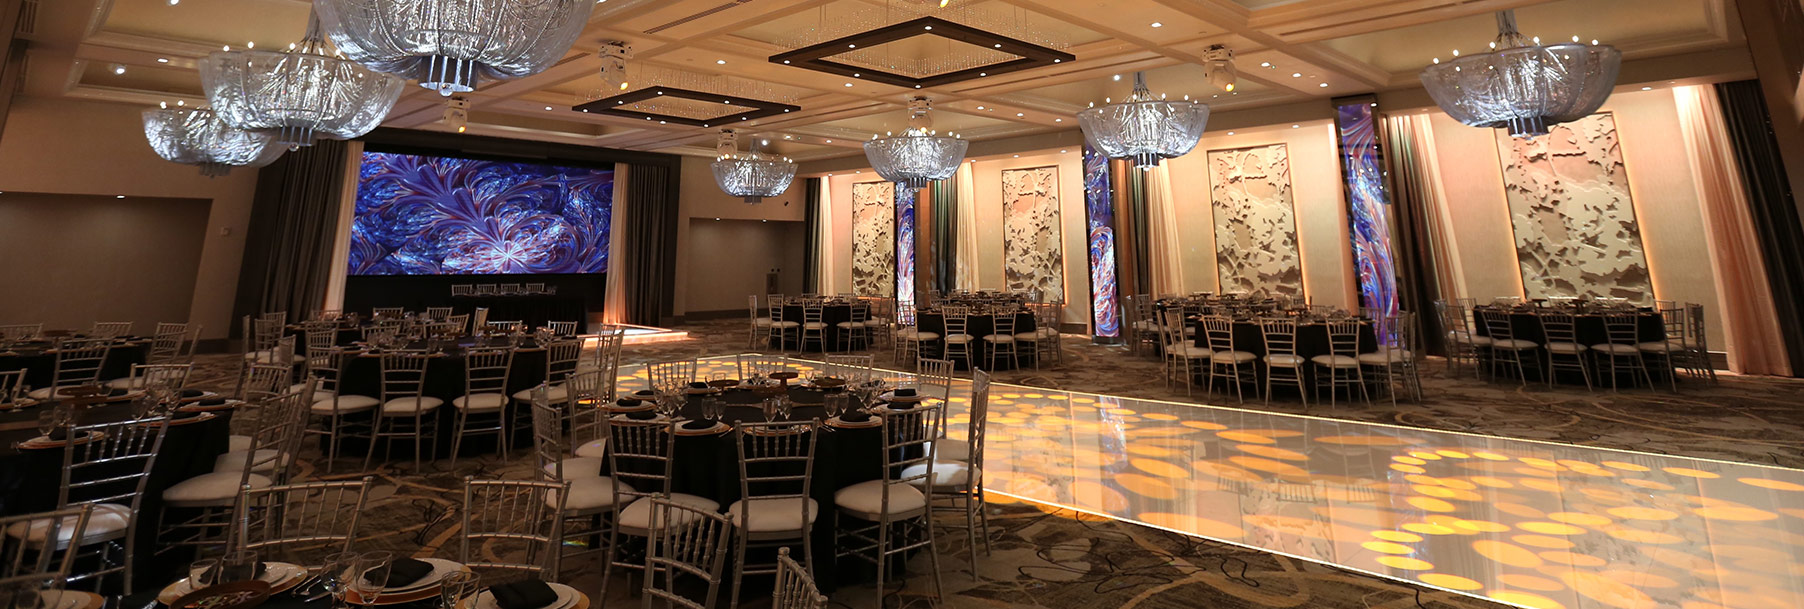 Best Banquet Halls In Los Angeles Glendale Ca Hollywood